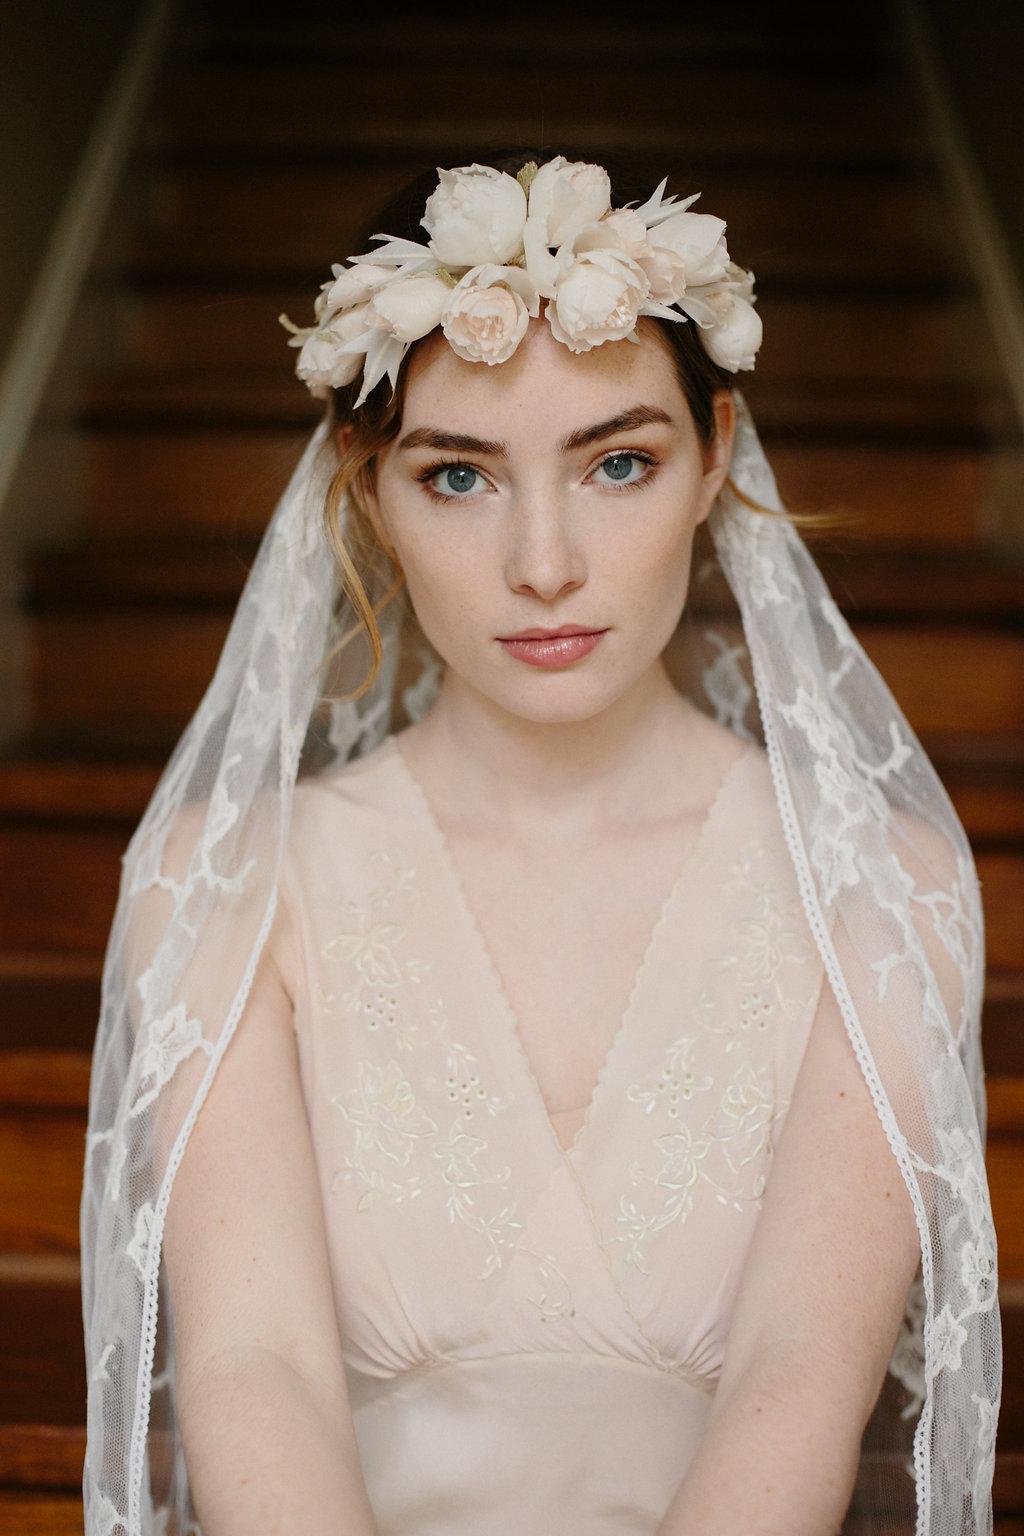 Bridal Silk Flower Crown Boho Chic Chantilly Lace